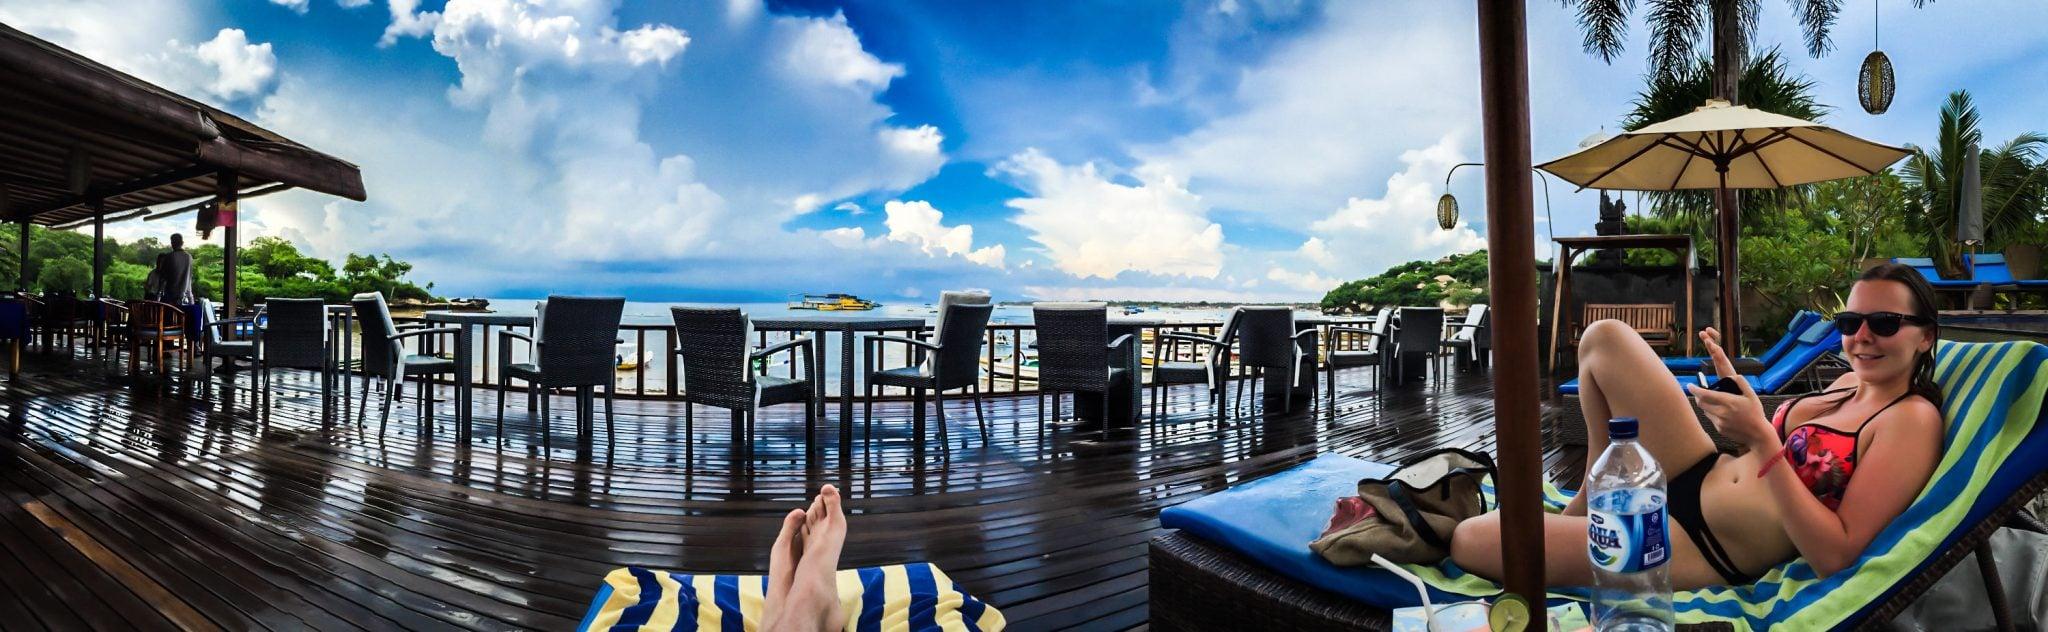 Nusa Lembongan Bay Shore Huts Panorama